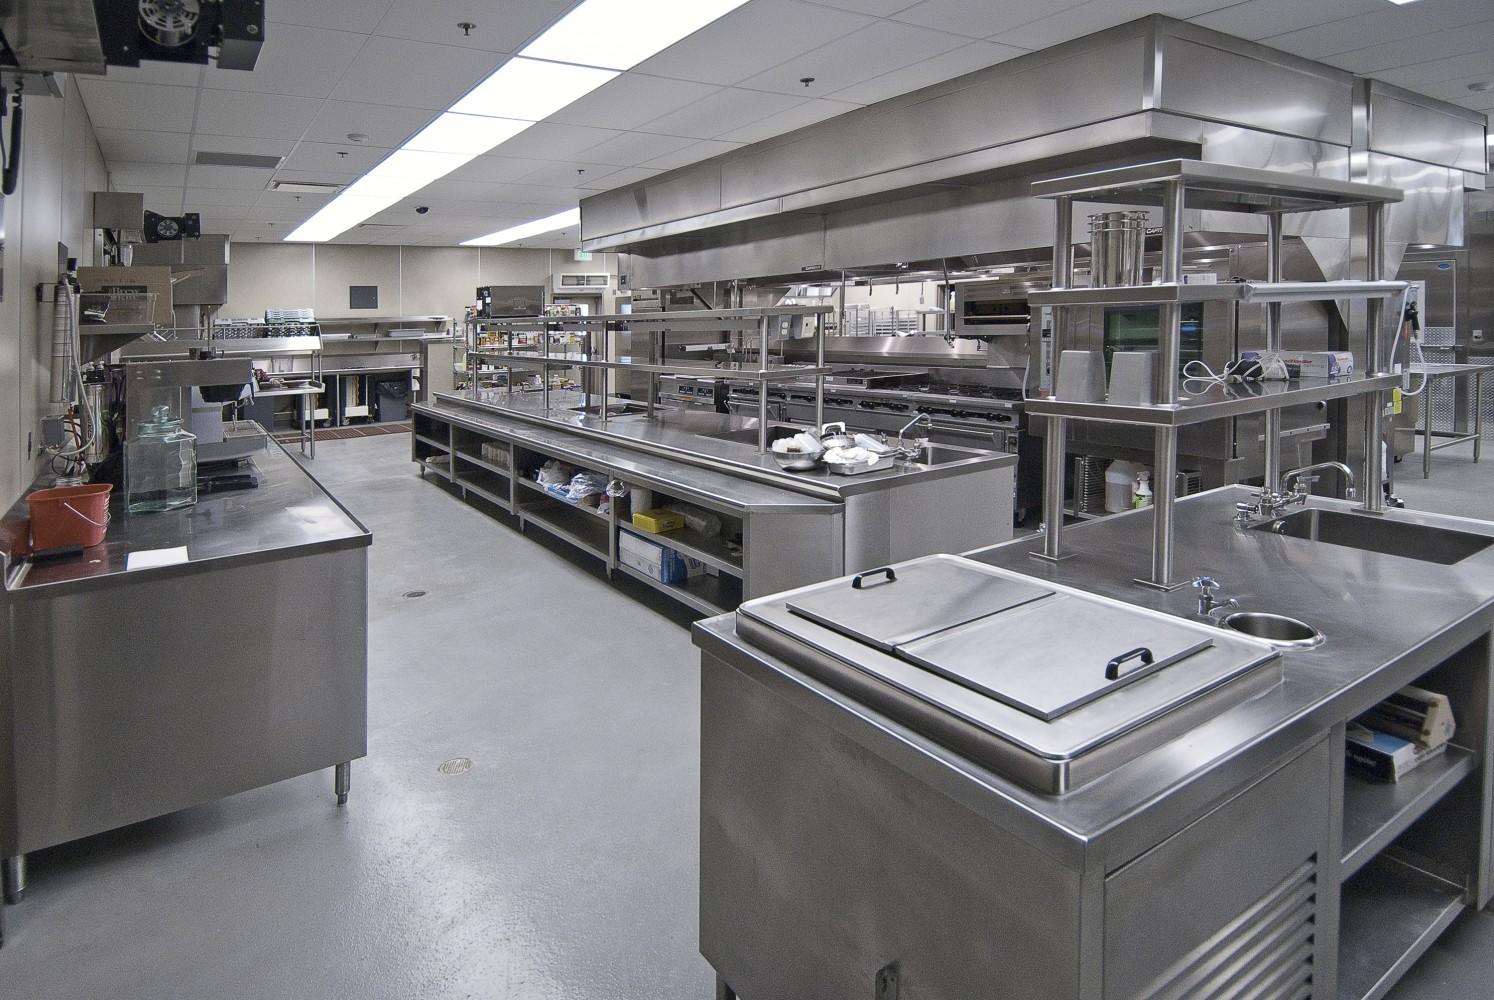 shop restaurant supplies equipment commercial appliances commercial kitchen design equipment hoods sinks messagenote